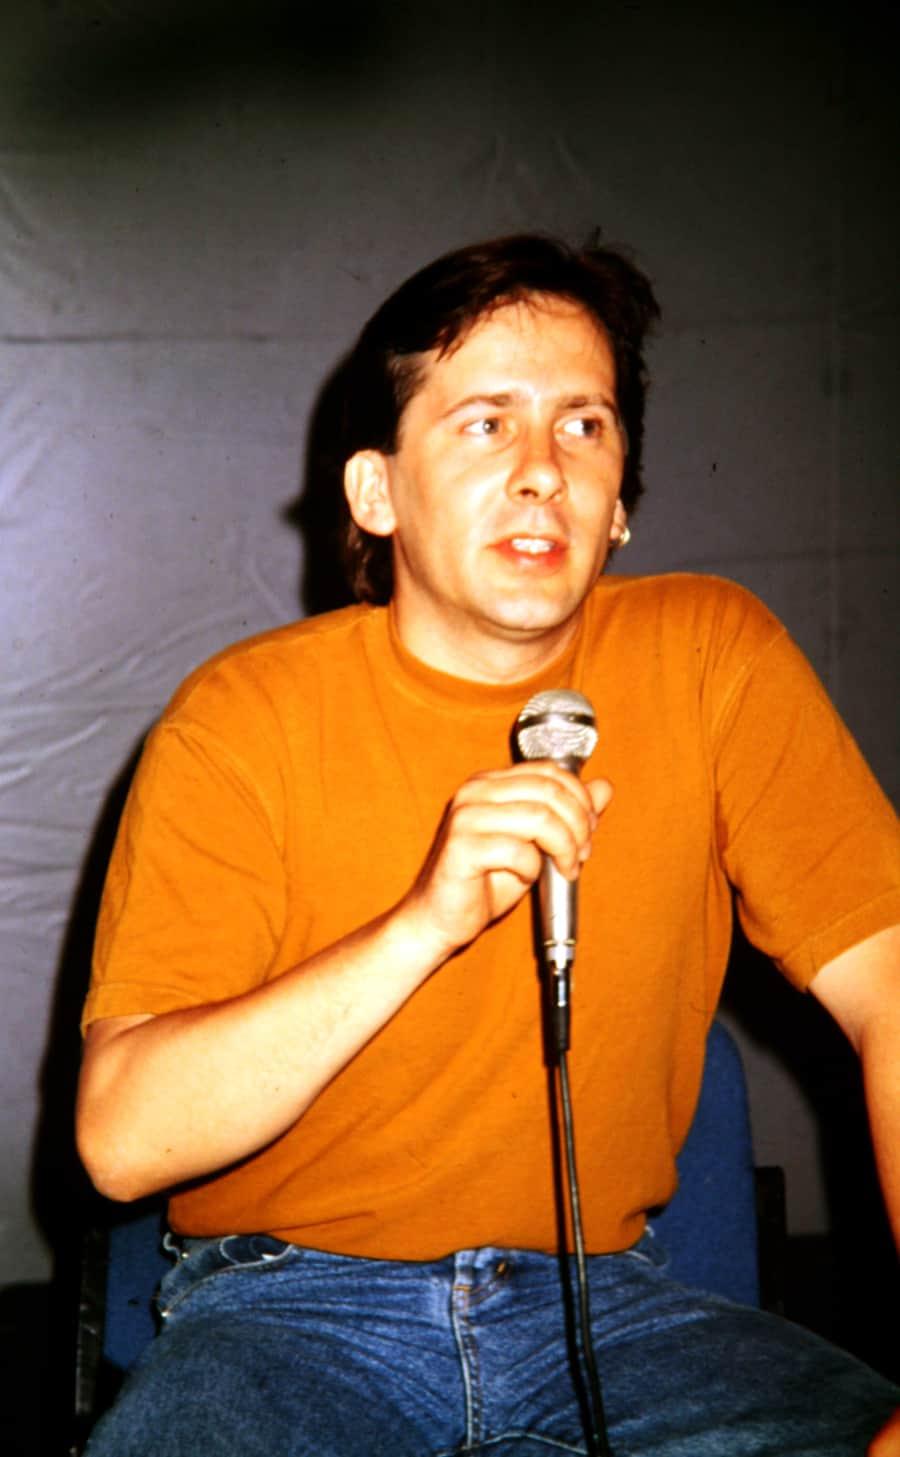 Gavin Hodge (Gorilla Tapes), 1994. Rassegna internazionale video d'autore. Taormina.